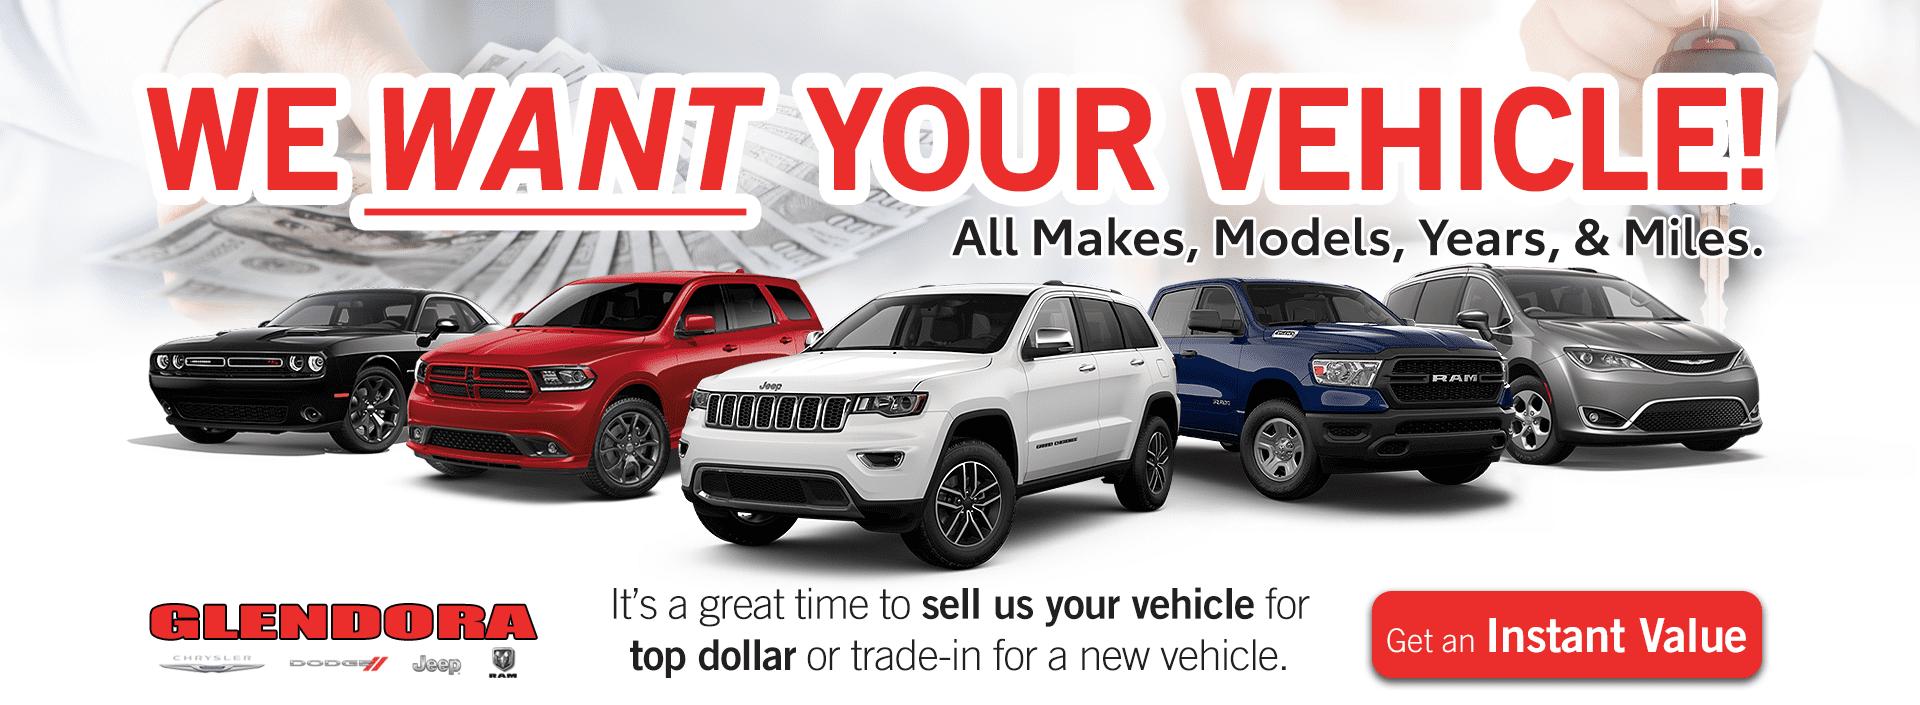 Glendora_Chrysler_Dodge_Jeep_Ram_Value_Your_Vehicle_Tradein_Instant_Value